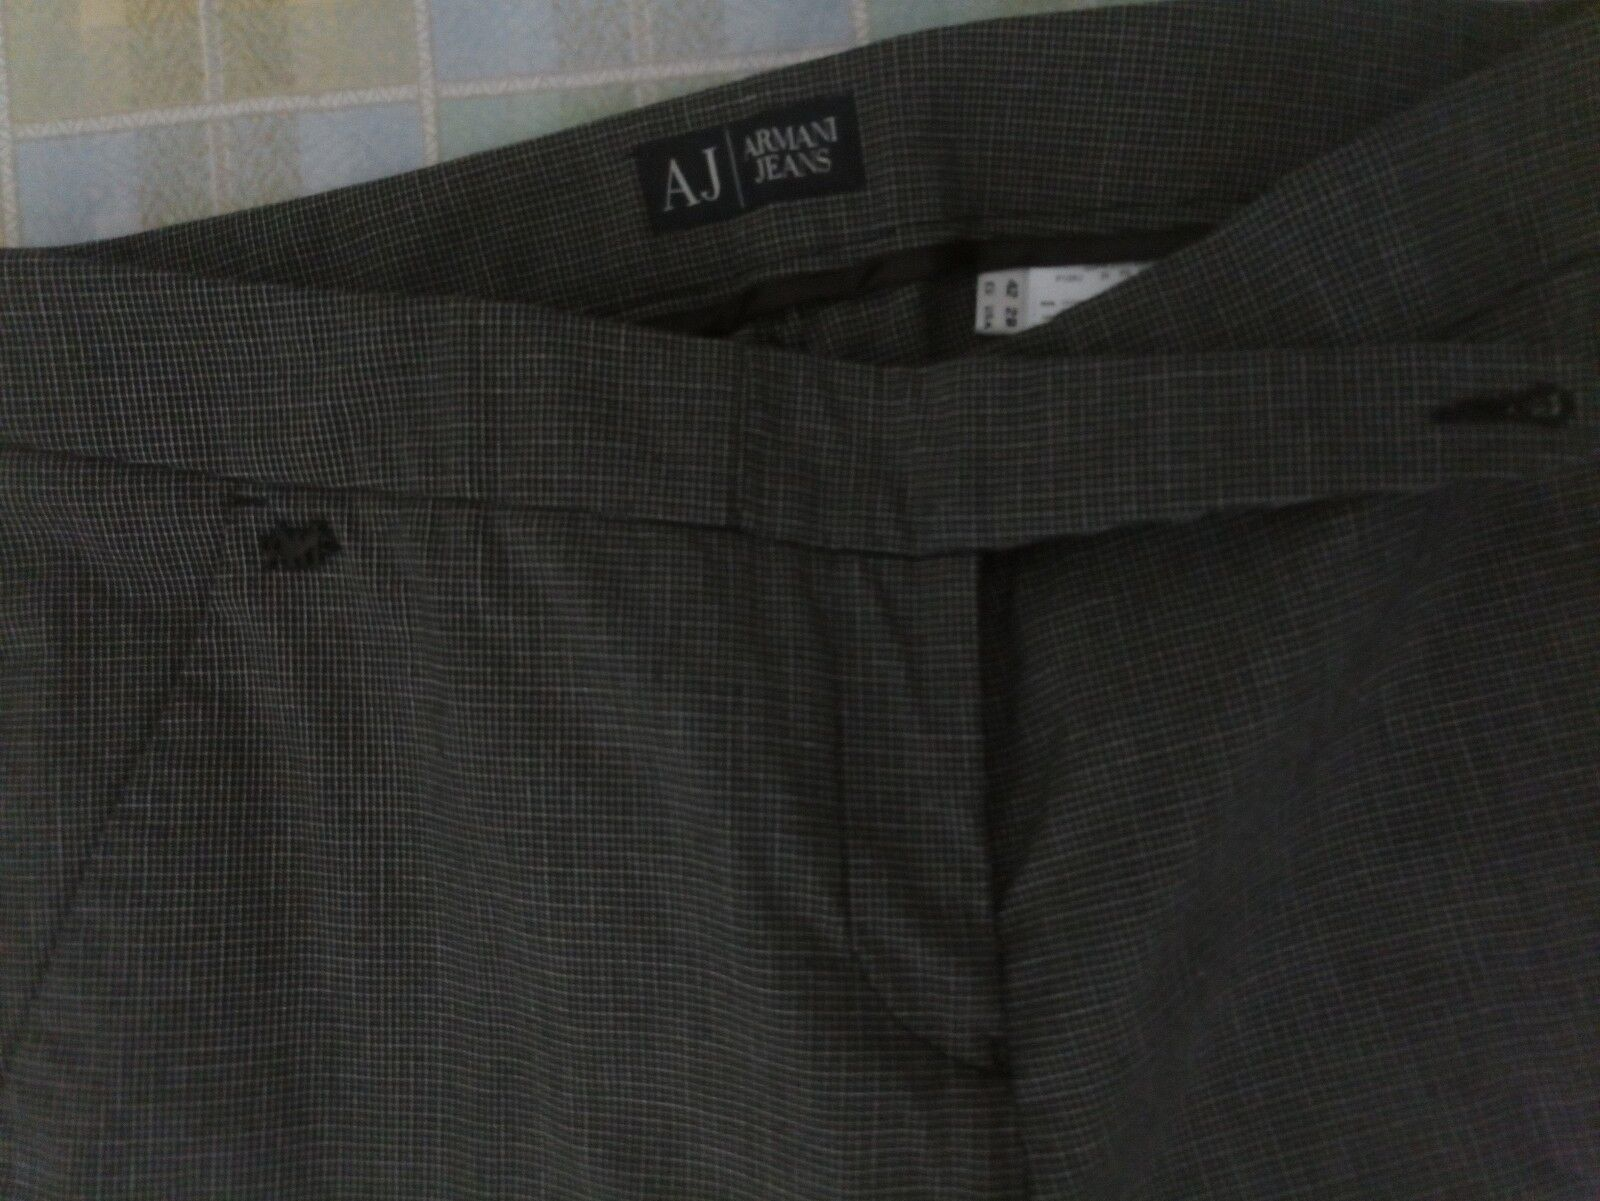 Pantalone AJ Armani jeans donna NUOVO